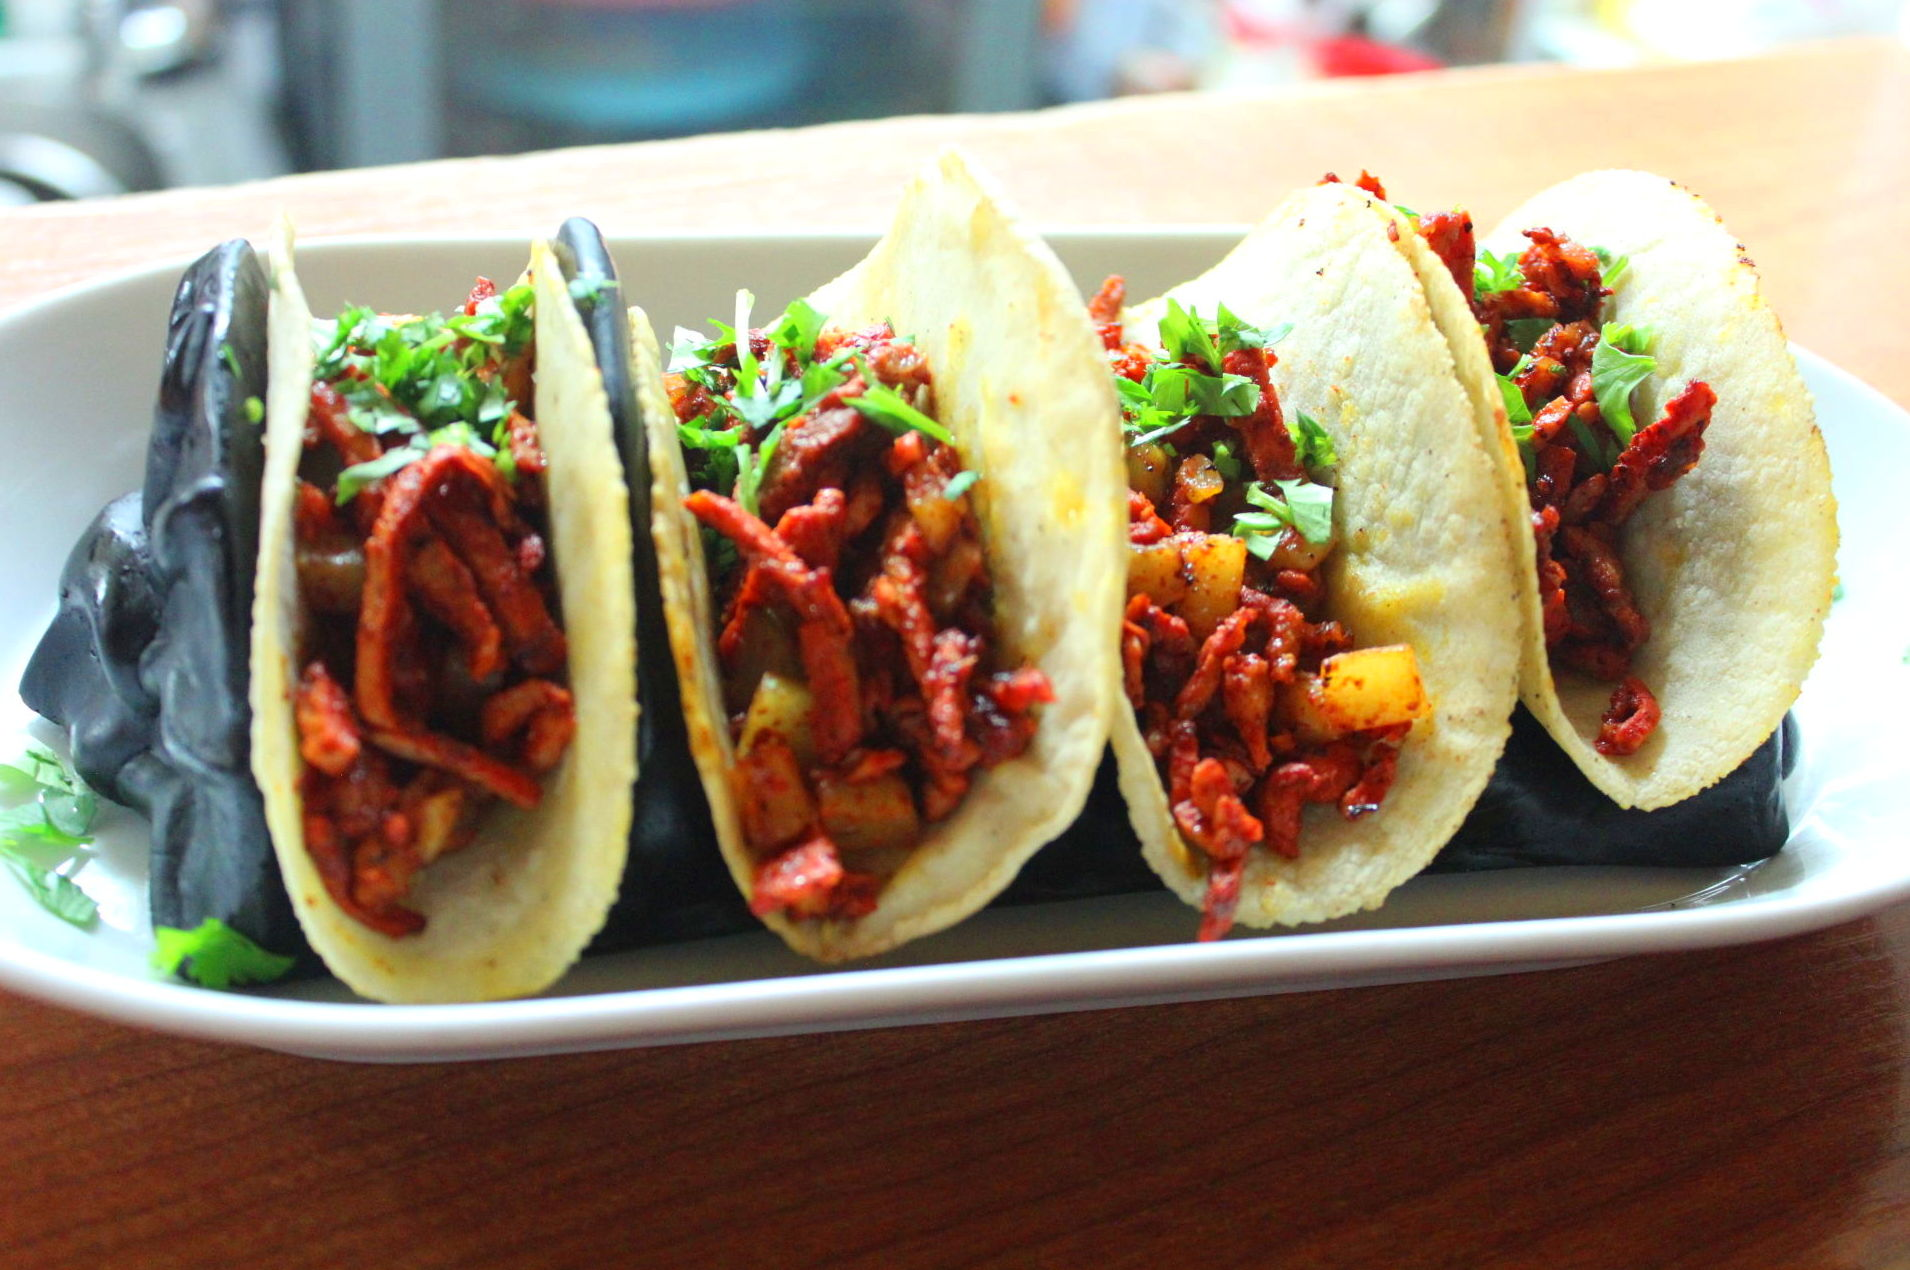 Foto 14 de Cocina mexicana en Madrid | Restaurante Mezcal